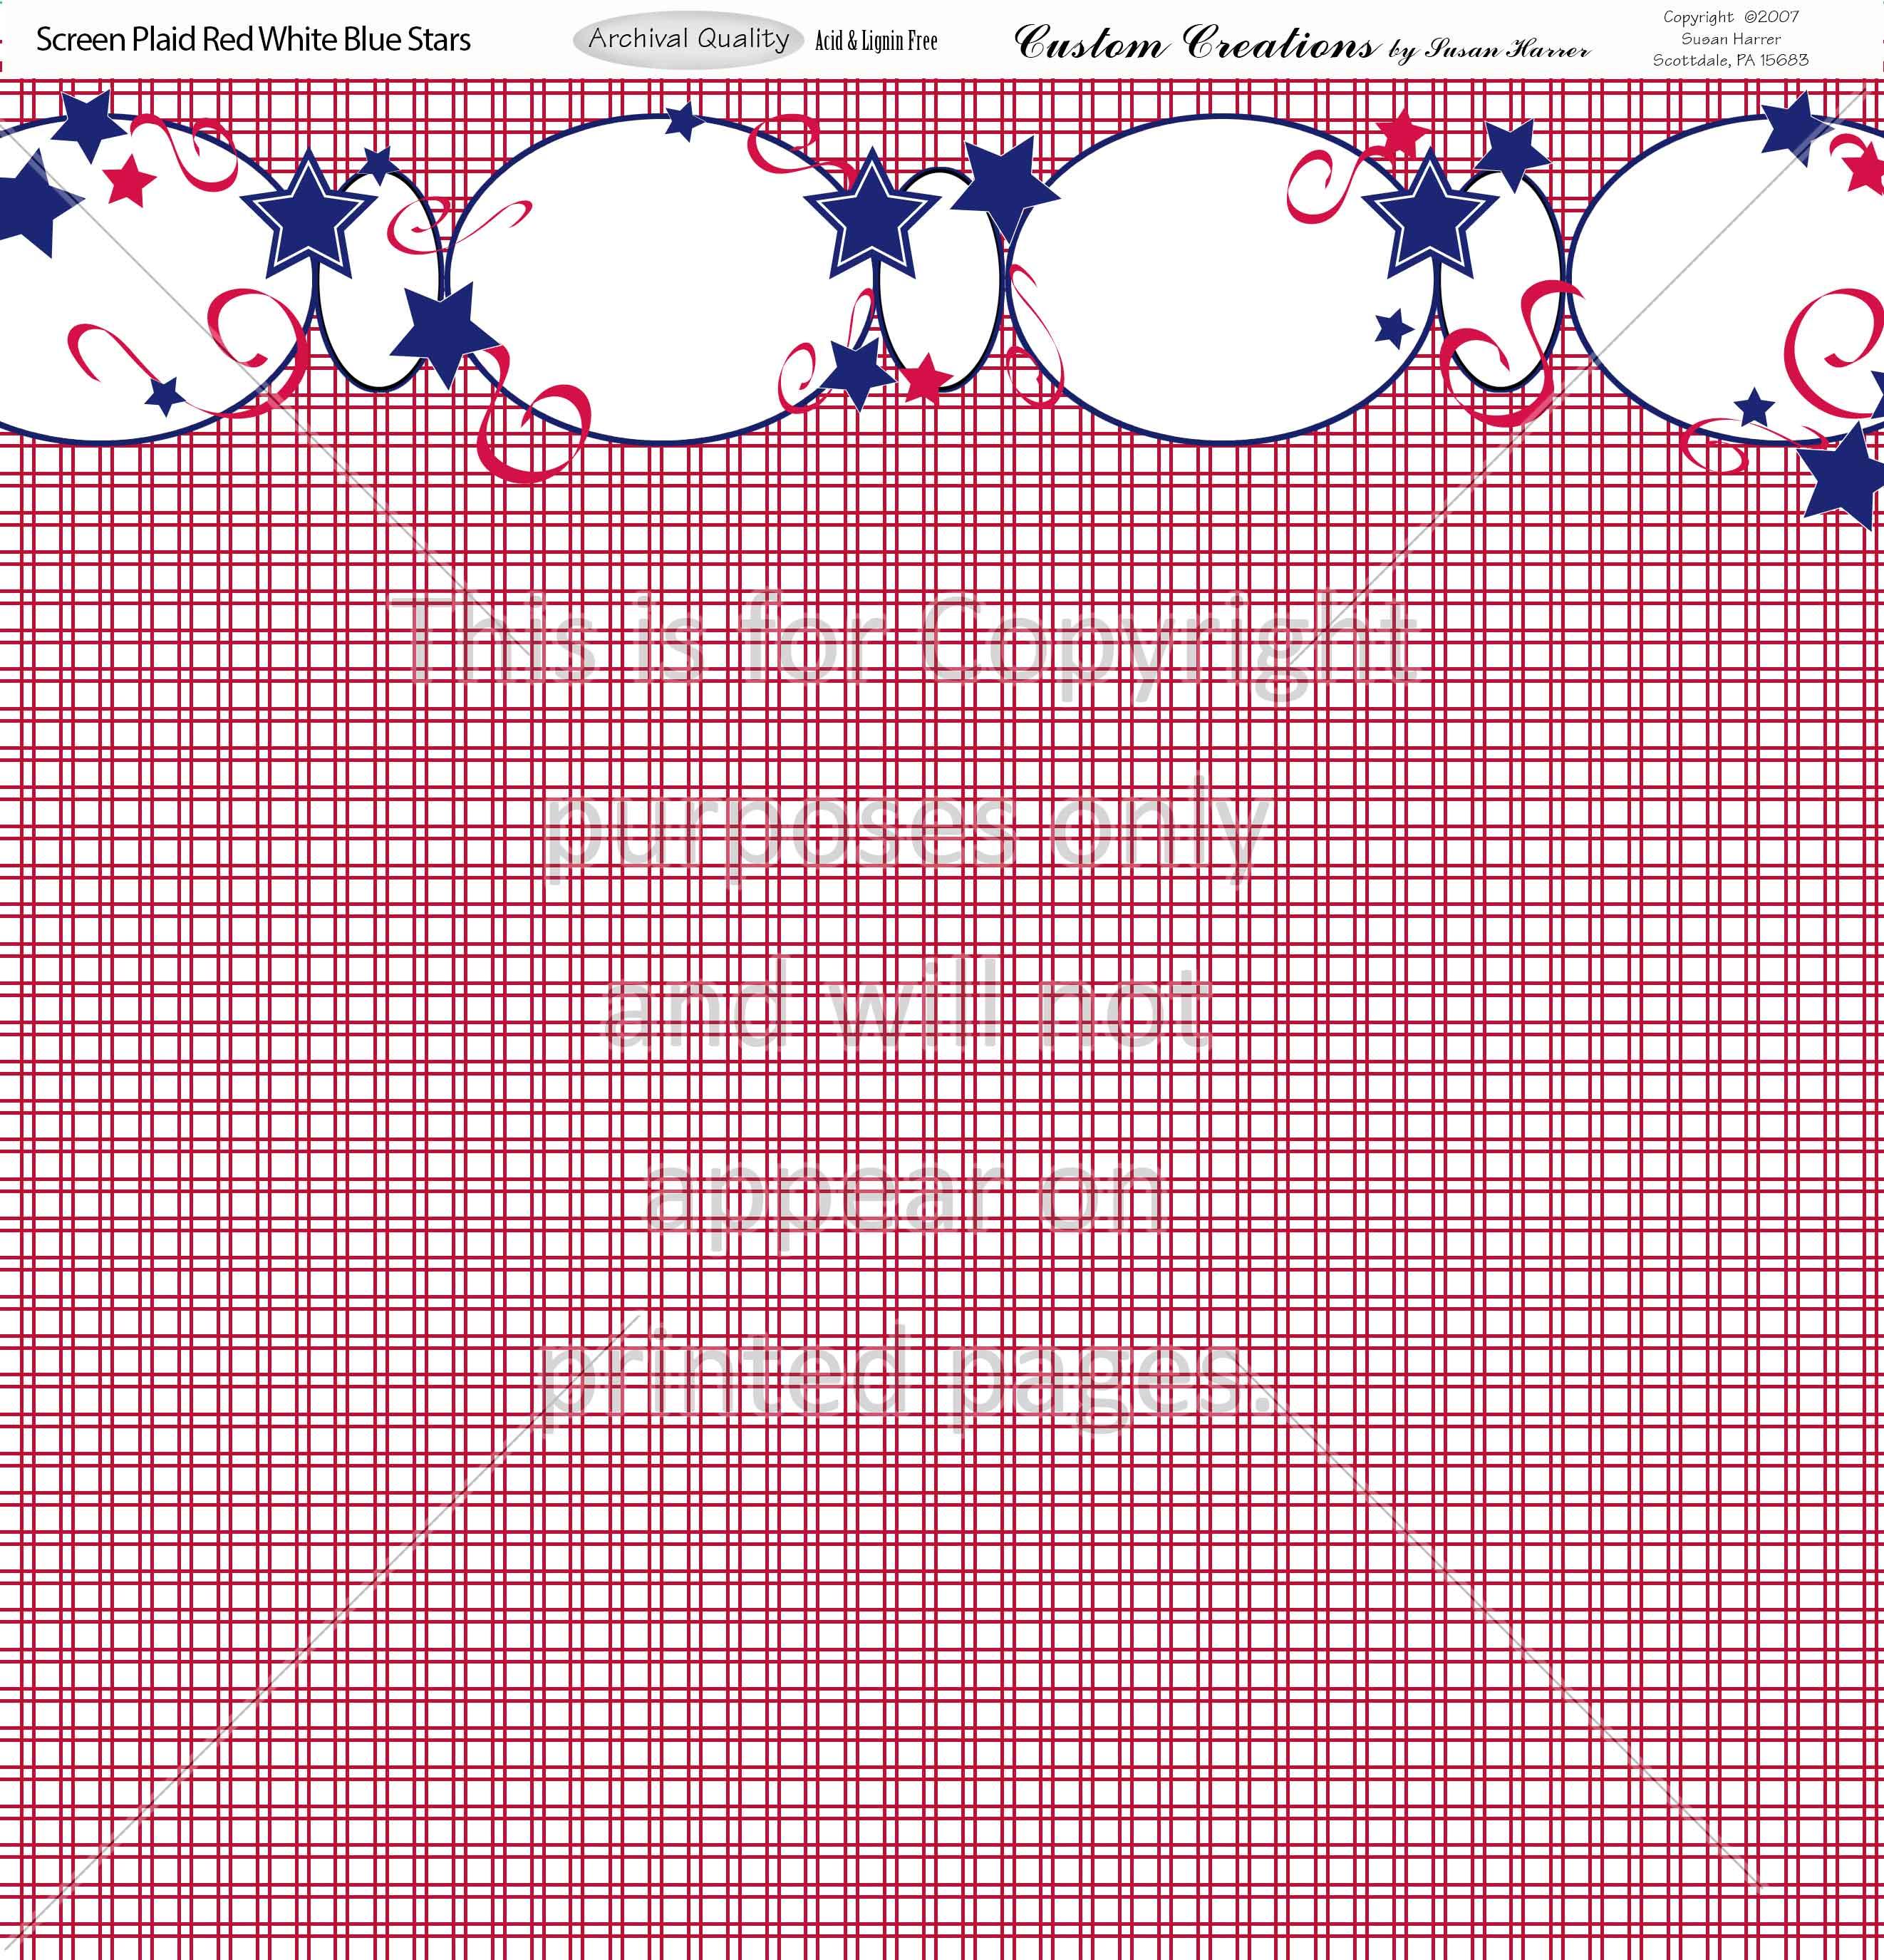 Screen Plaid Red White Blue Stars Smh Illustration Design